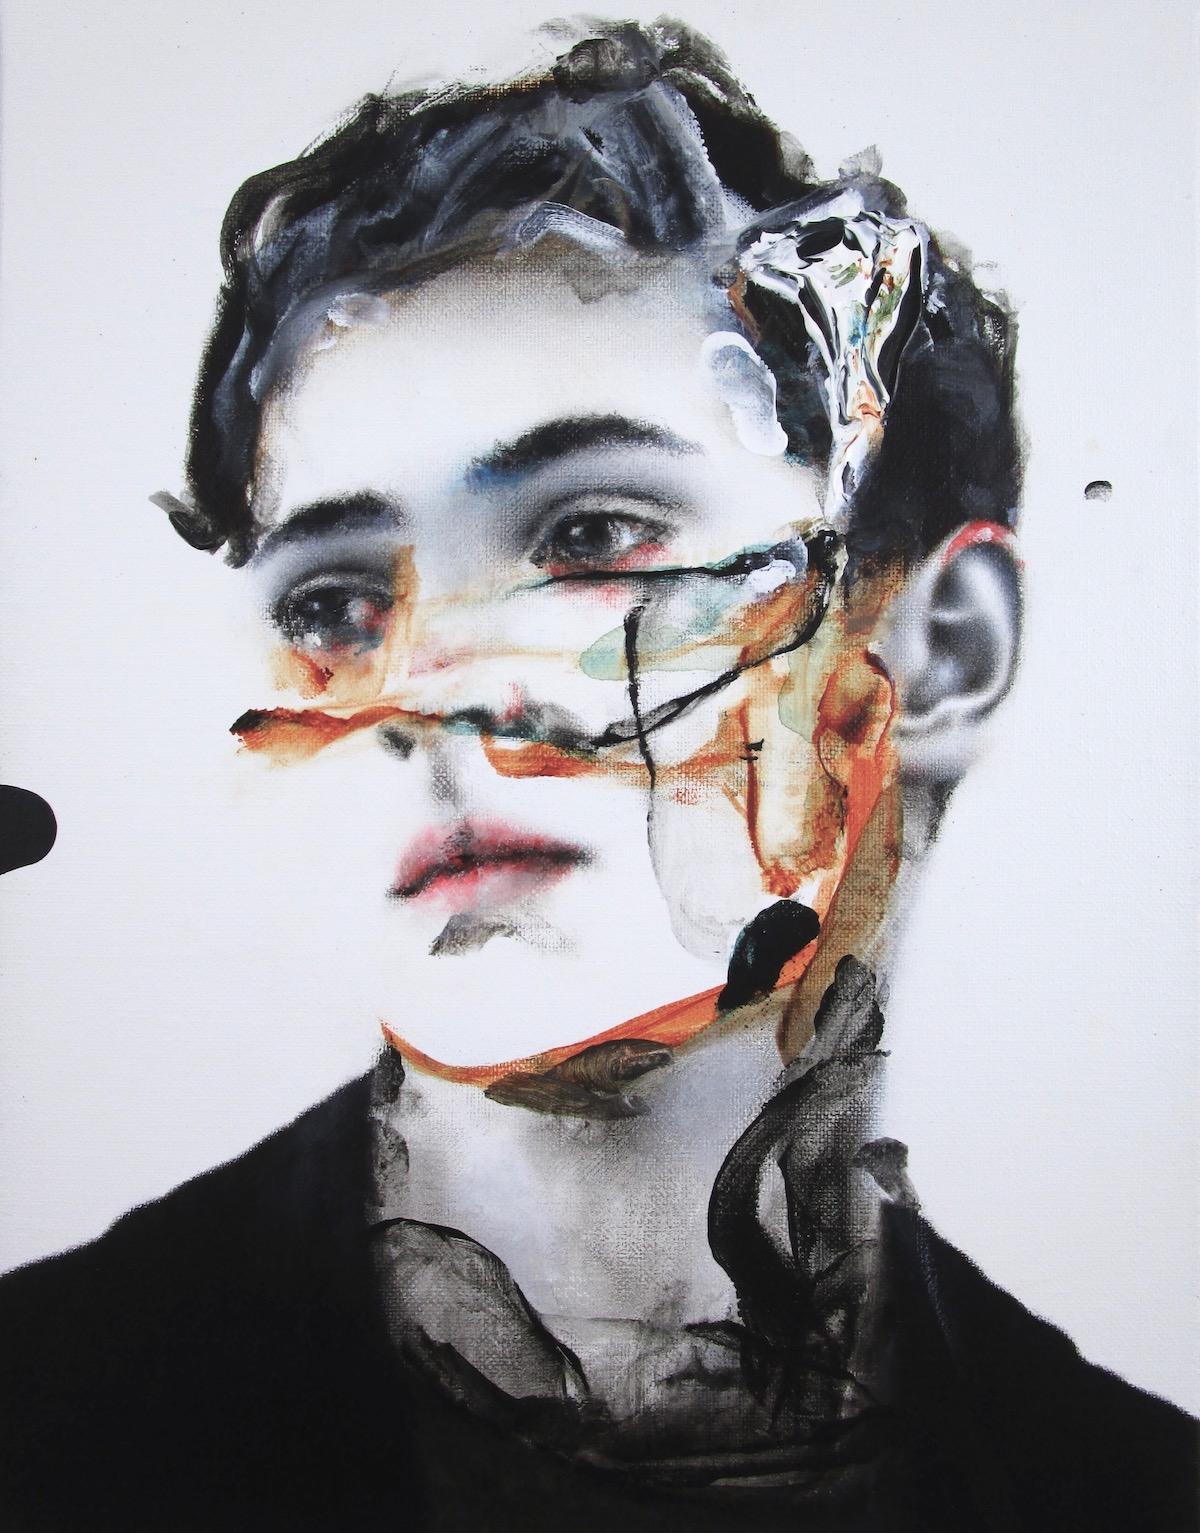 antoine cordet canvas toile peinture painting portrait art artist artiste peintre acrylic oil a knife in the back